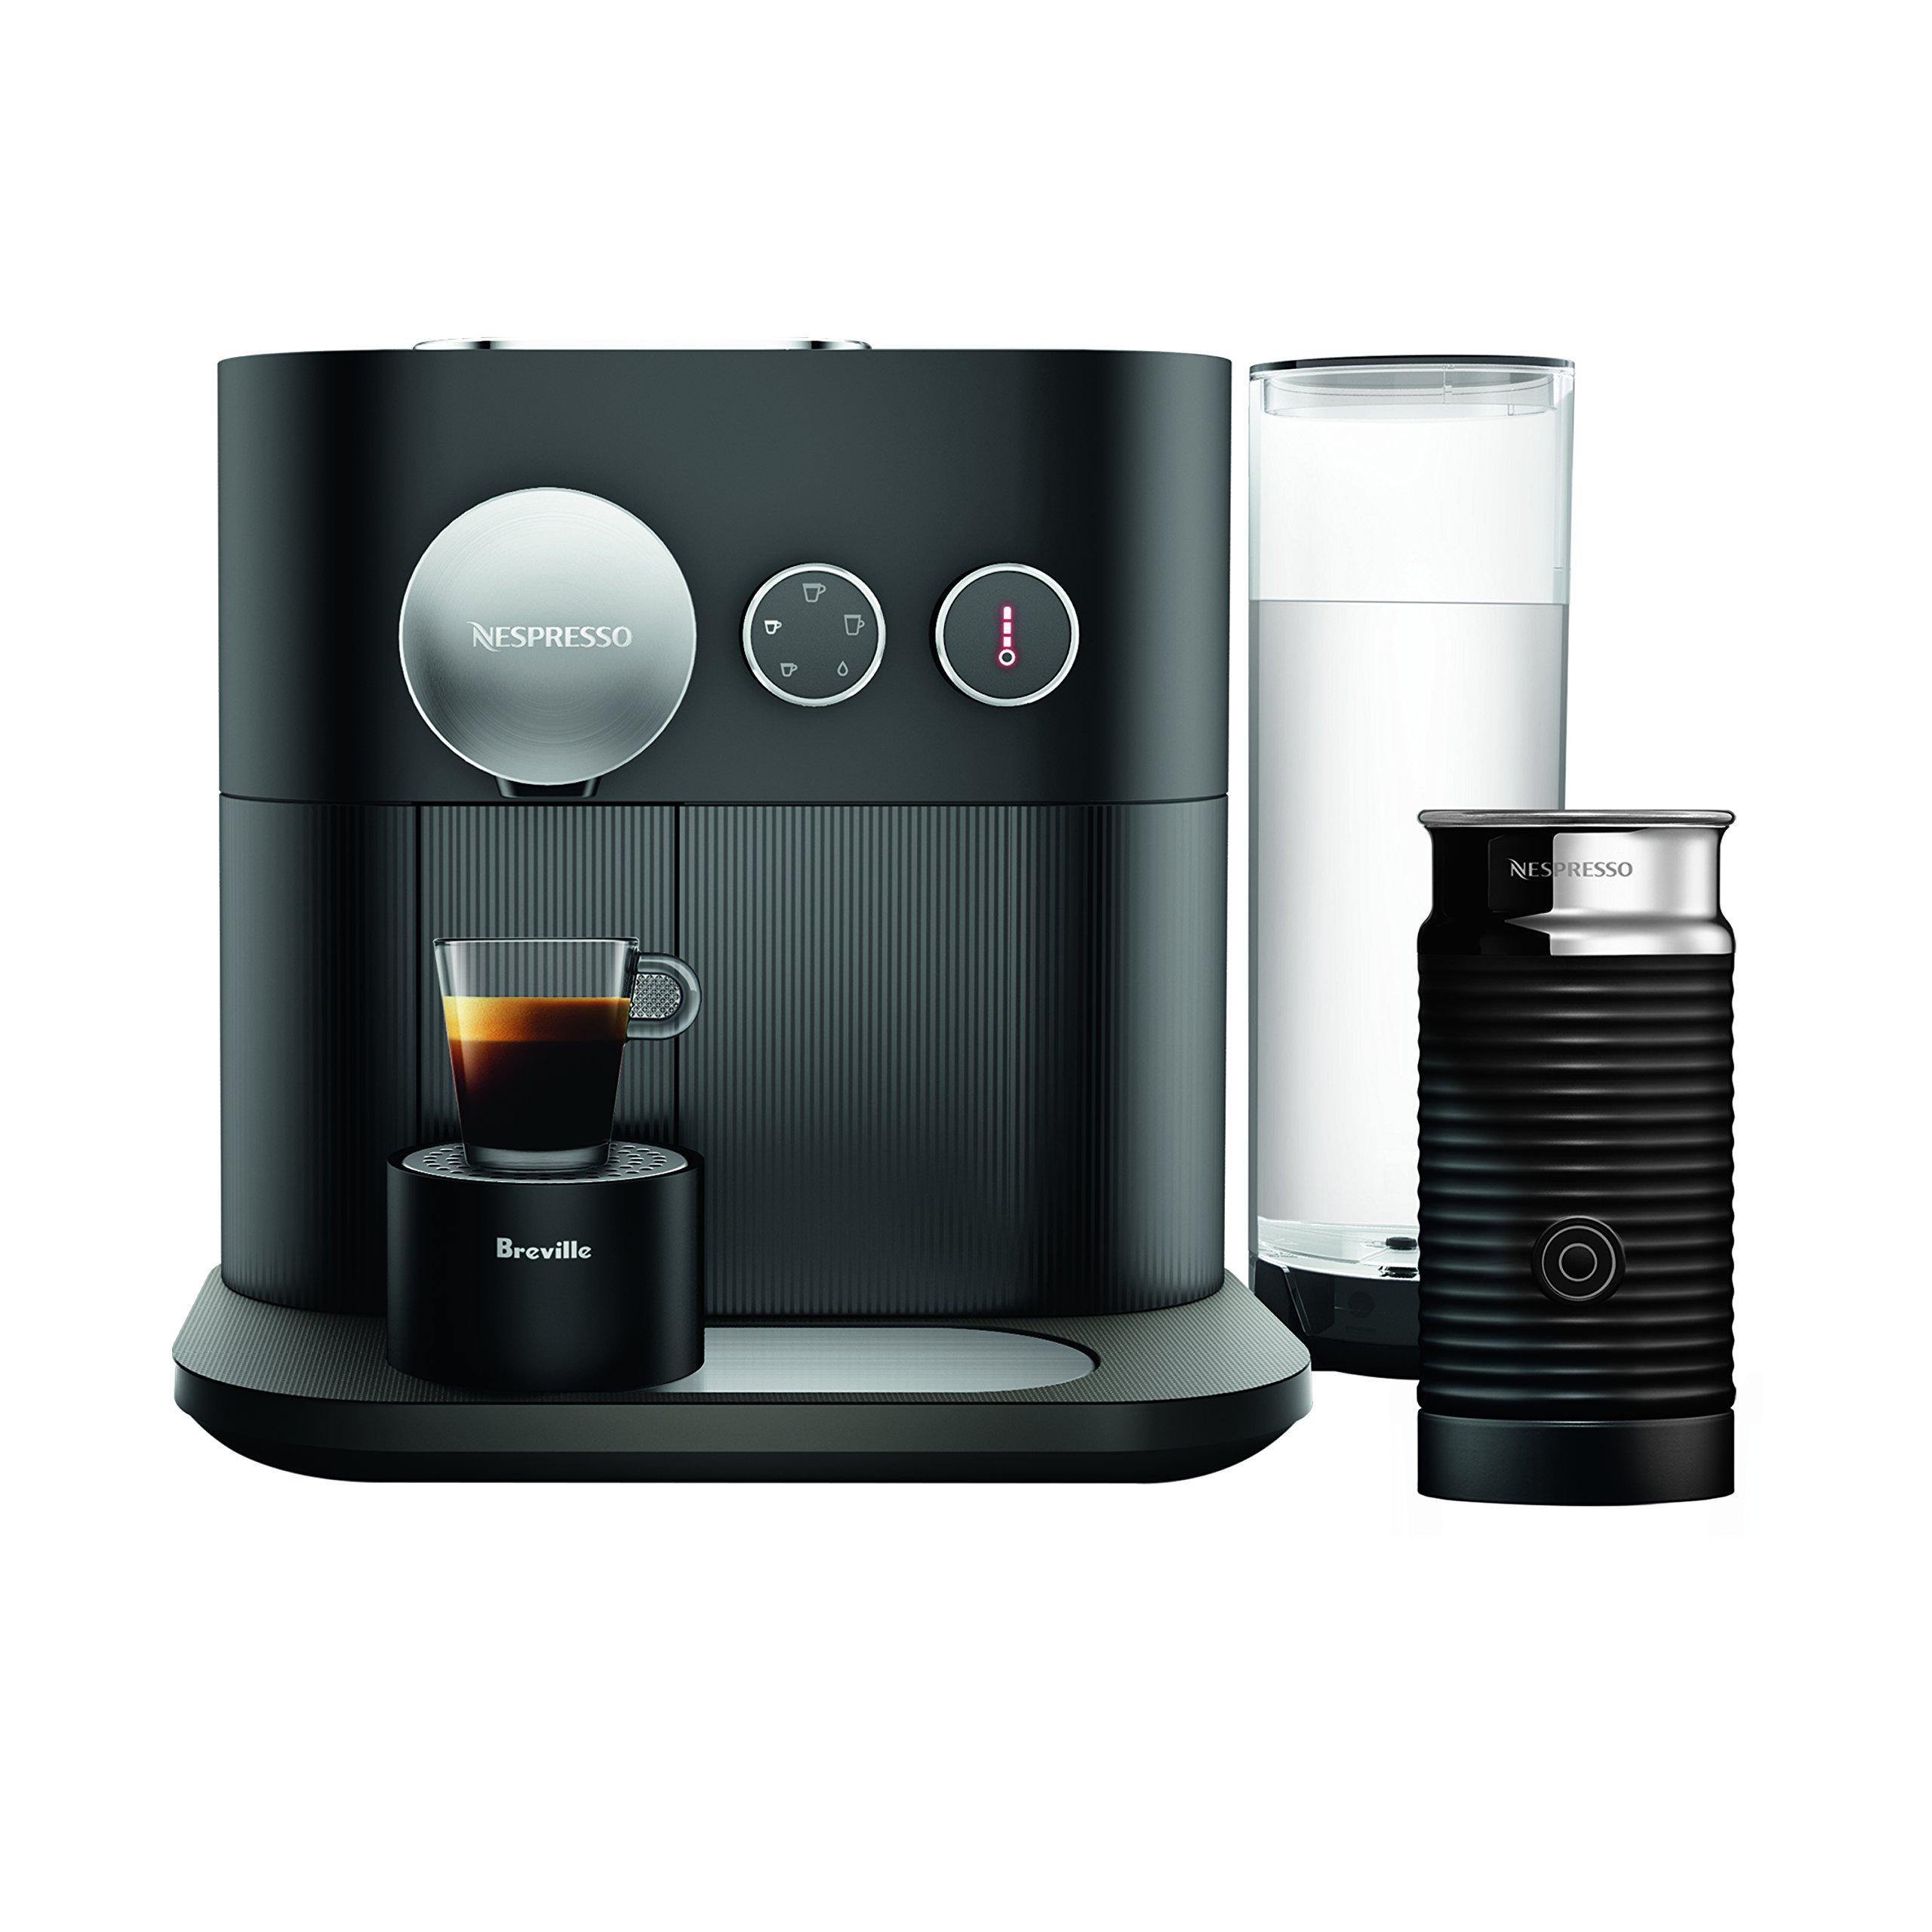 ویکالا · خرید  اصل اورجینال · خرید از آمازون · Breville-Nespresso USA BES750BLK Nespresso Expert by Breville with Aeroccino, Black Espresso & Coffee Maker wekala · ویکالا